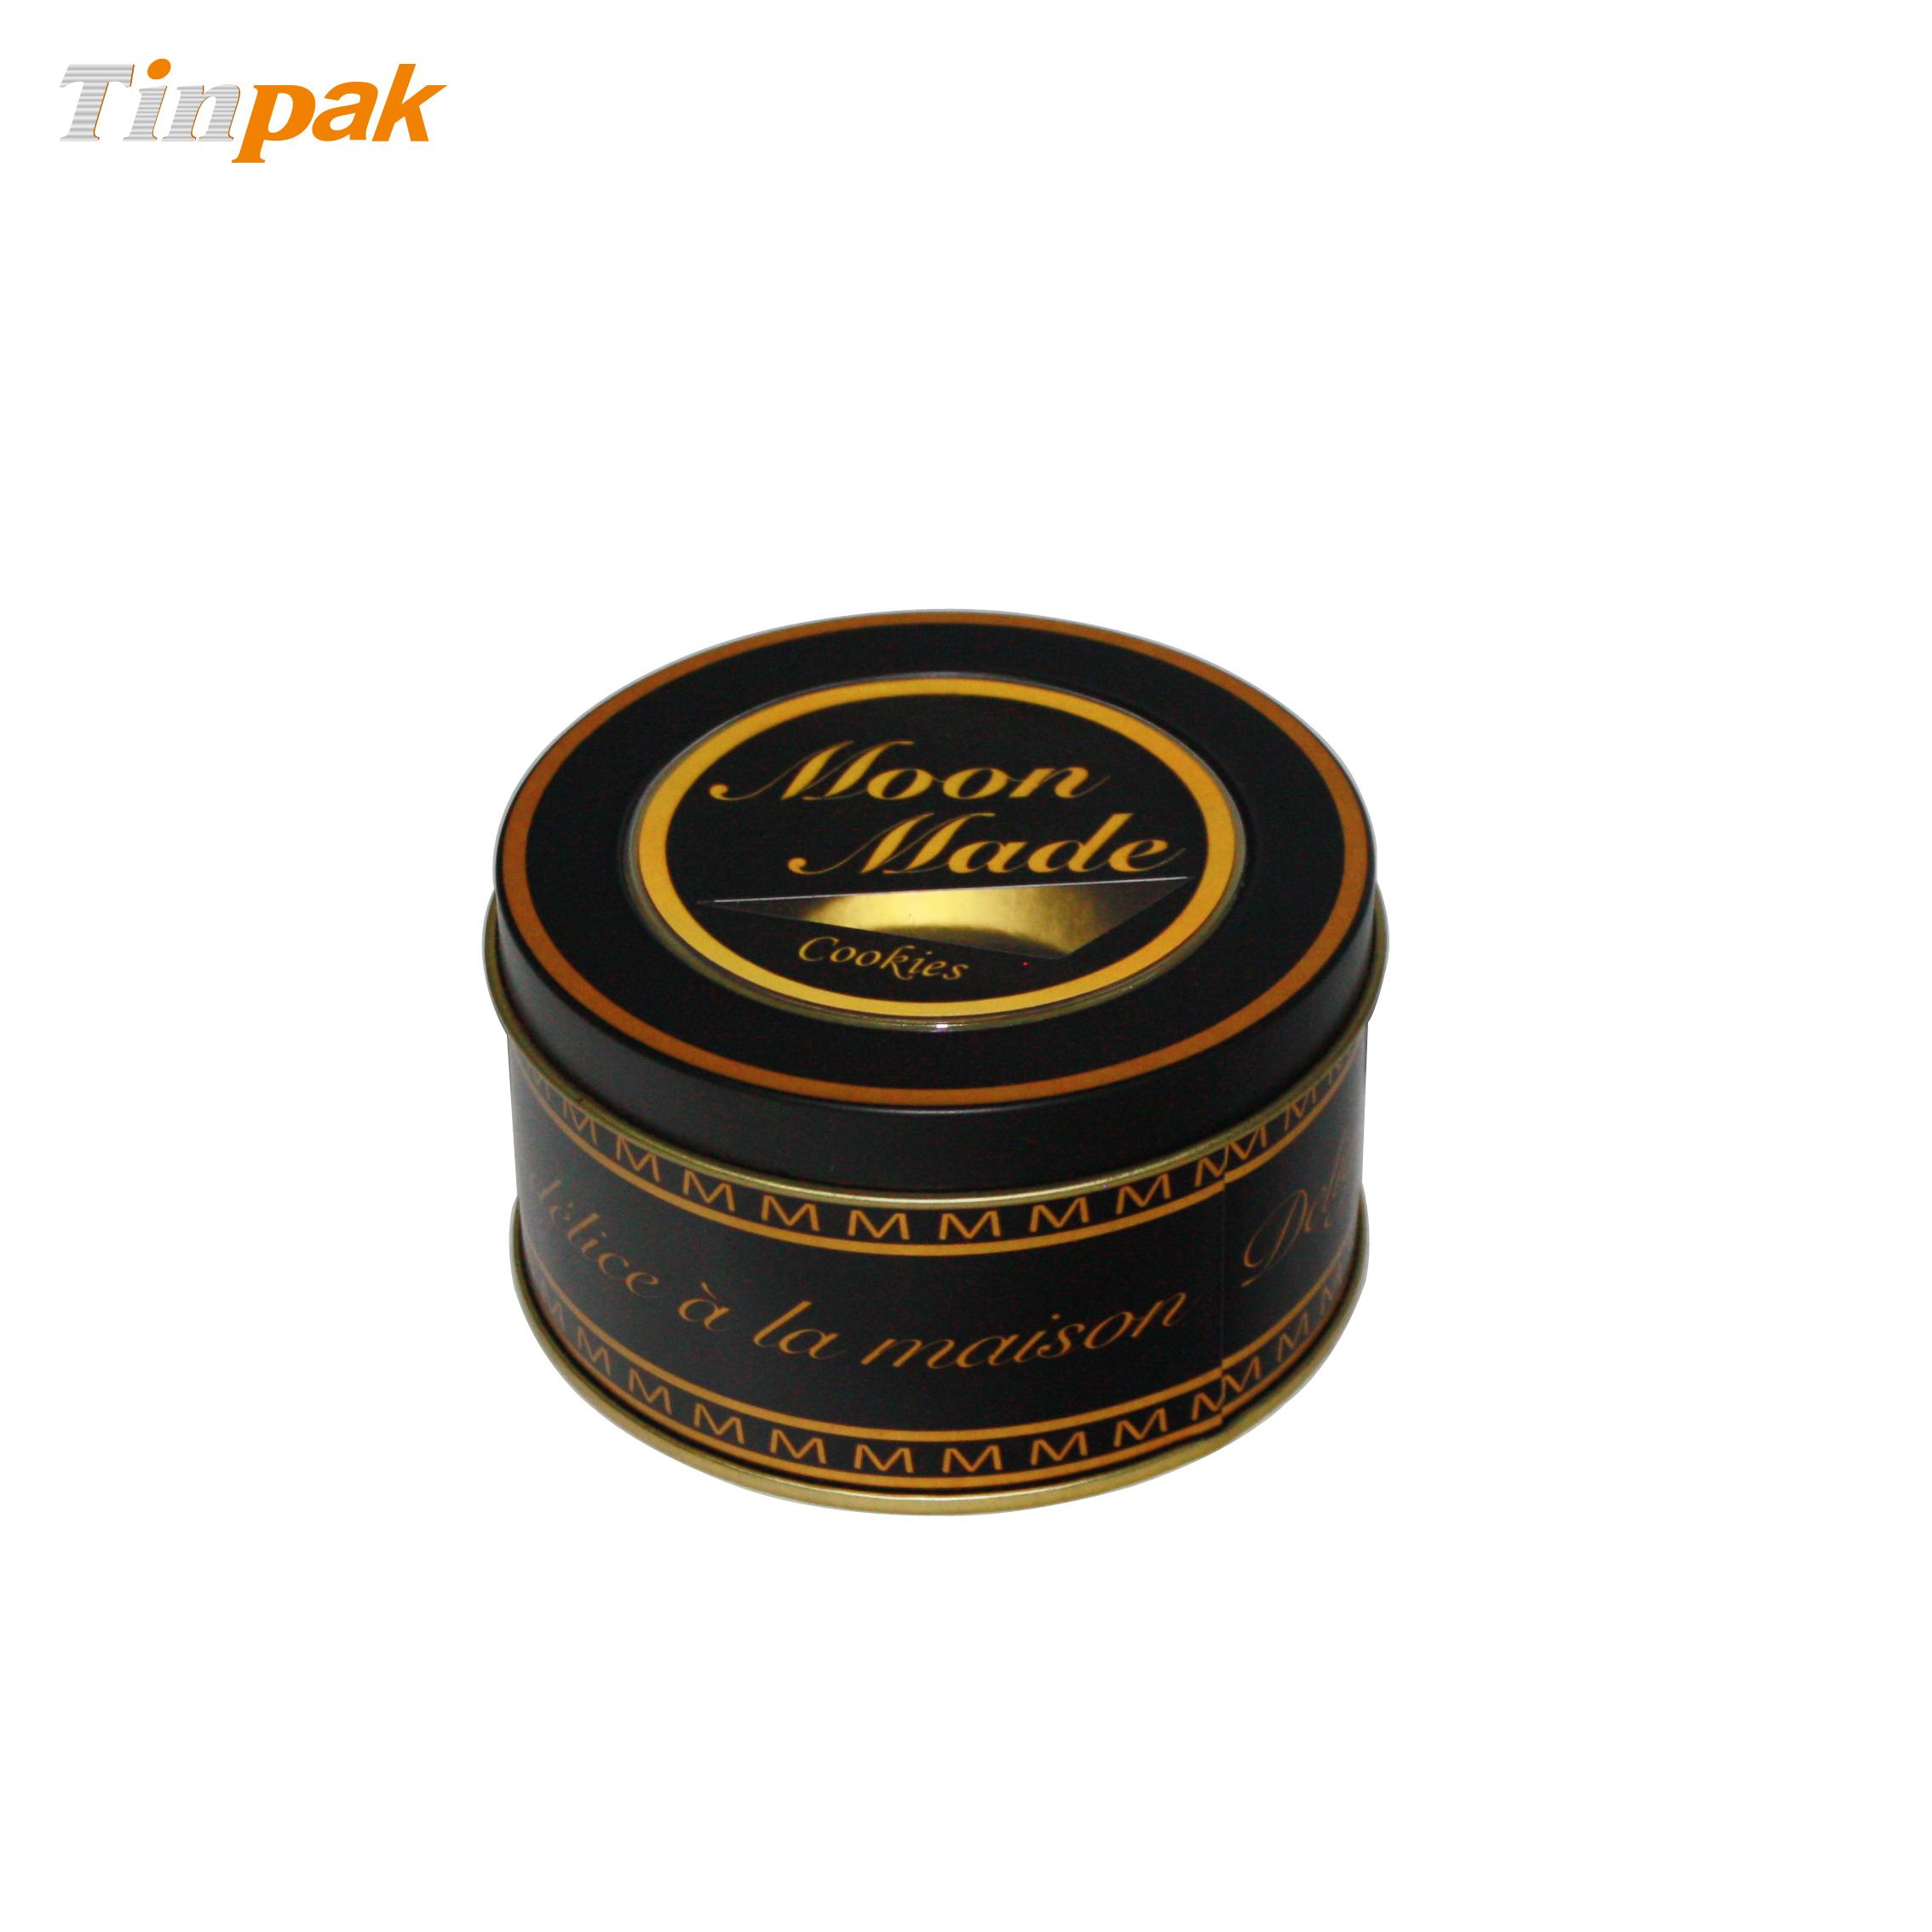 Vintage Cookie Tin Wholesale Supplier